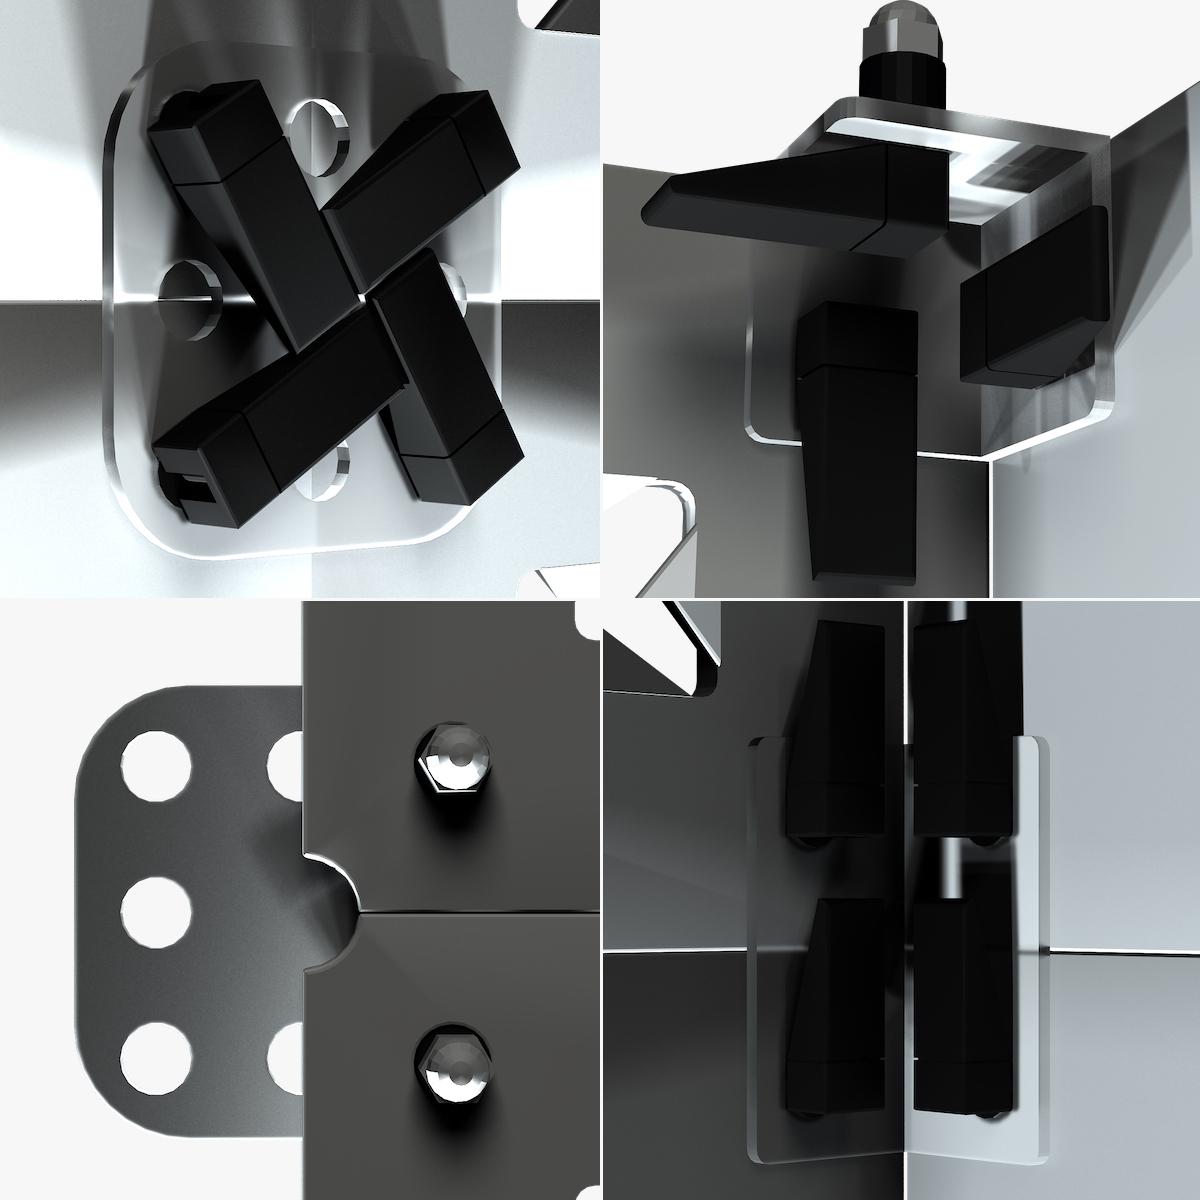 70-01-11-1200x1200.jpg Download STL file Stage Decor Collection 01 (Modular 9 Pieces) • 3D printer model, akerStudio